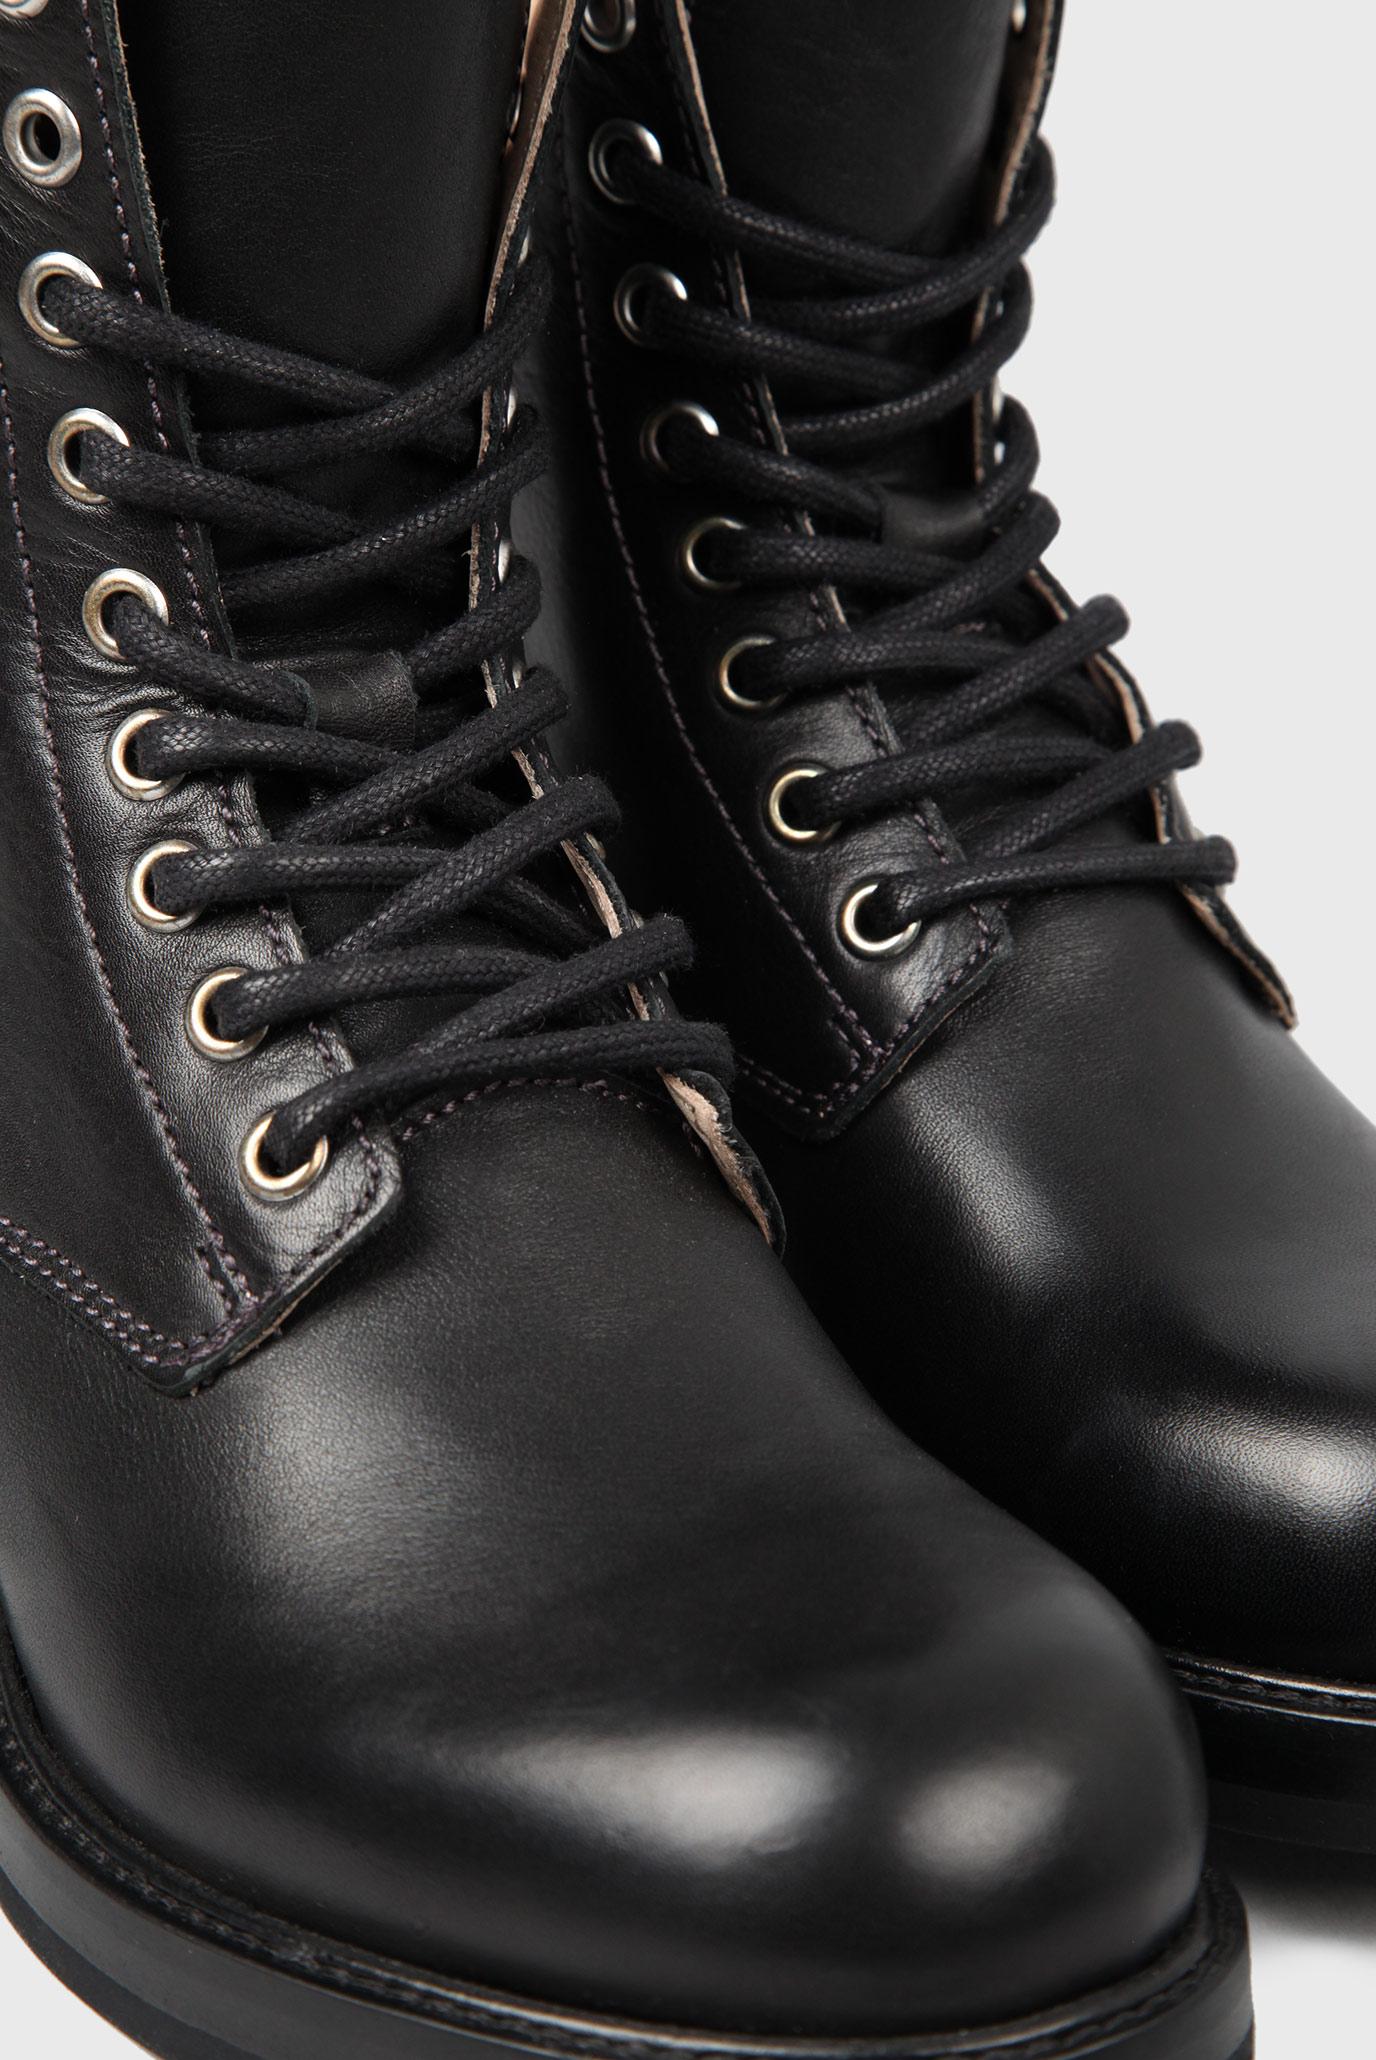 f10f6e5a87e7 Купить Женские кожаные ботинки Diesel Diesel Y01529 PR030 – Киев, Украина.  Цены в интернет магазине MD Fashion